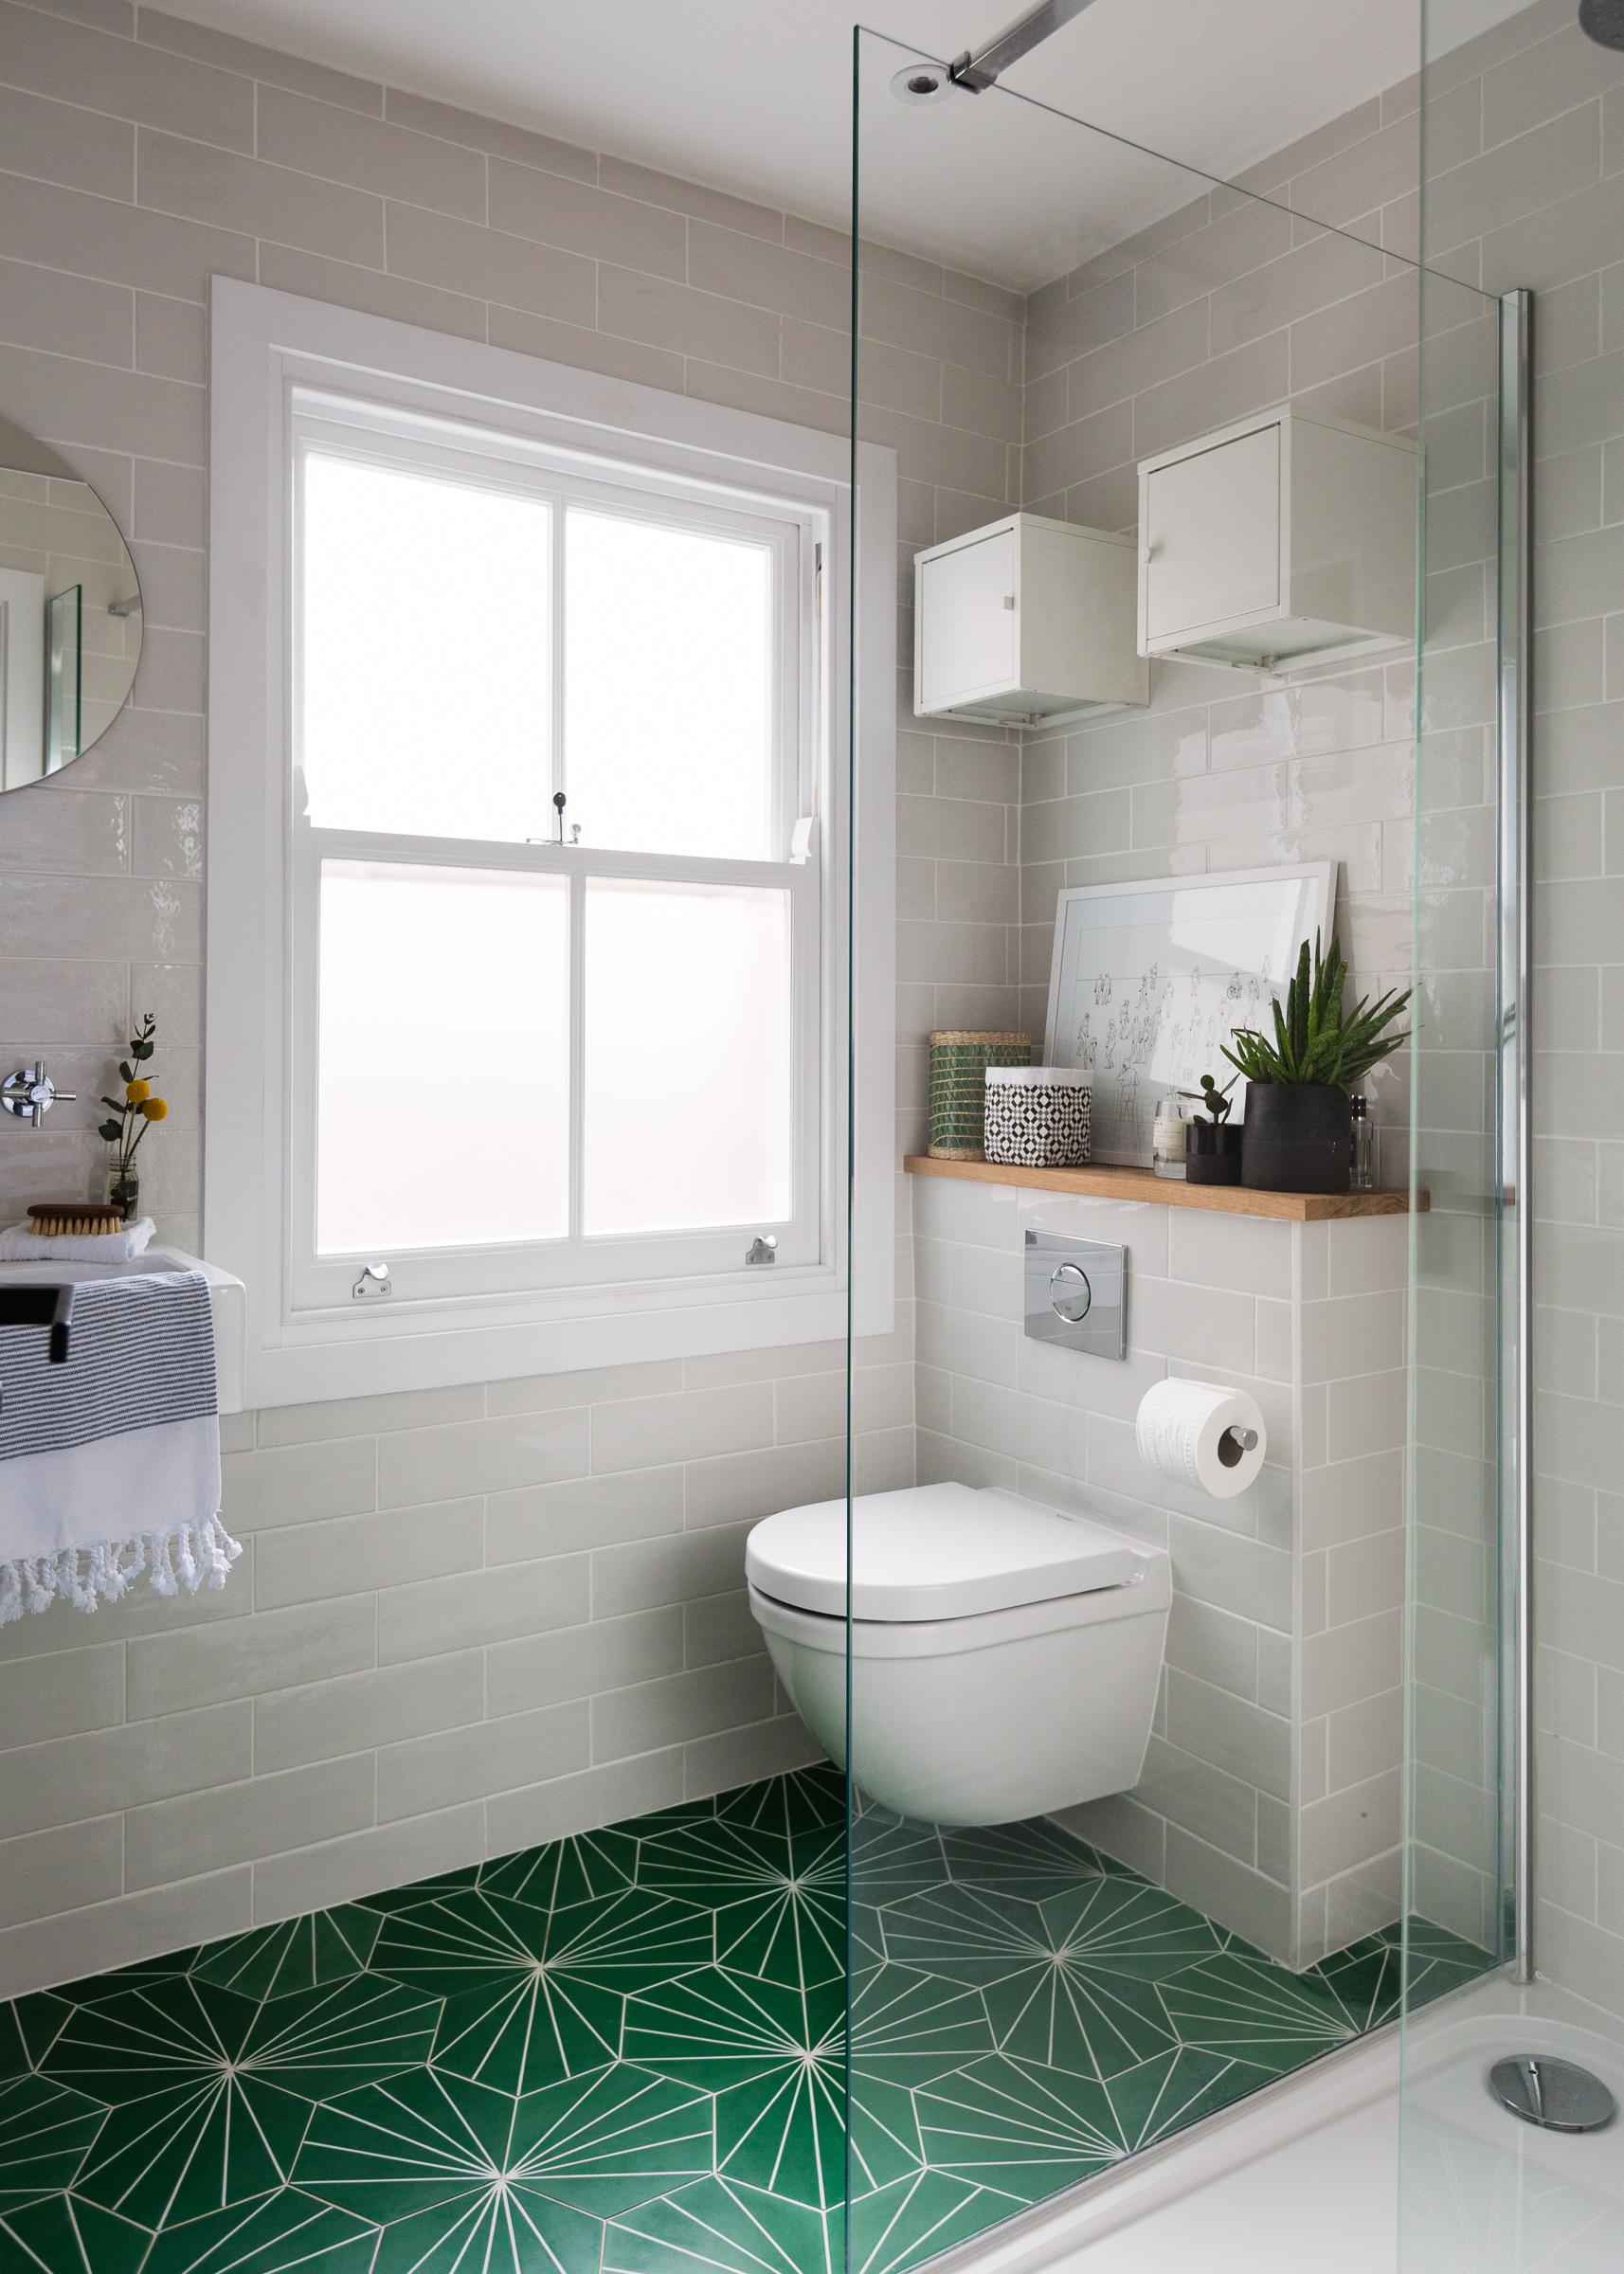 Bathroom tile ideas bathroom tiles VMCPZXL